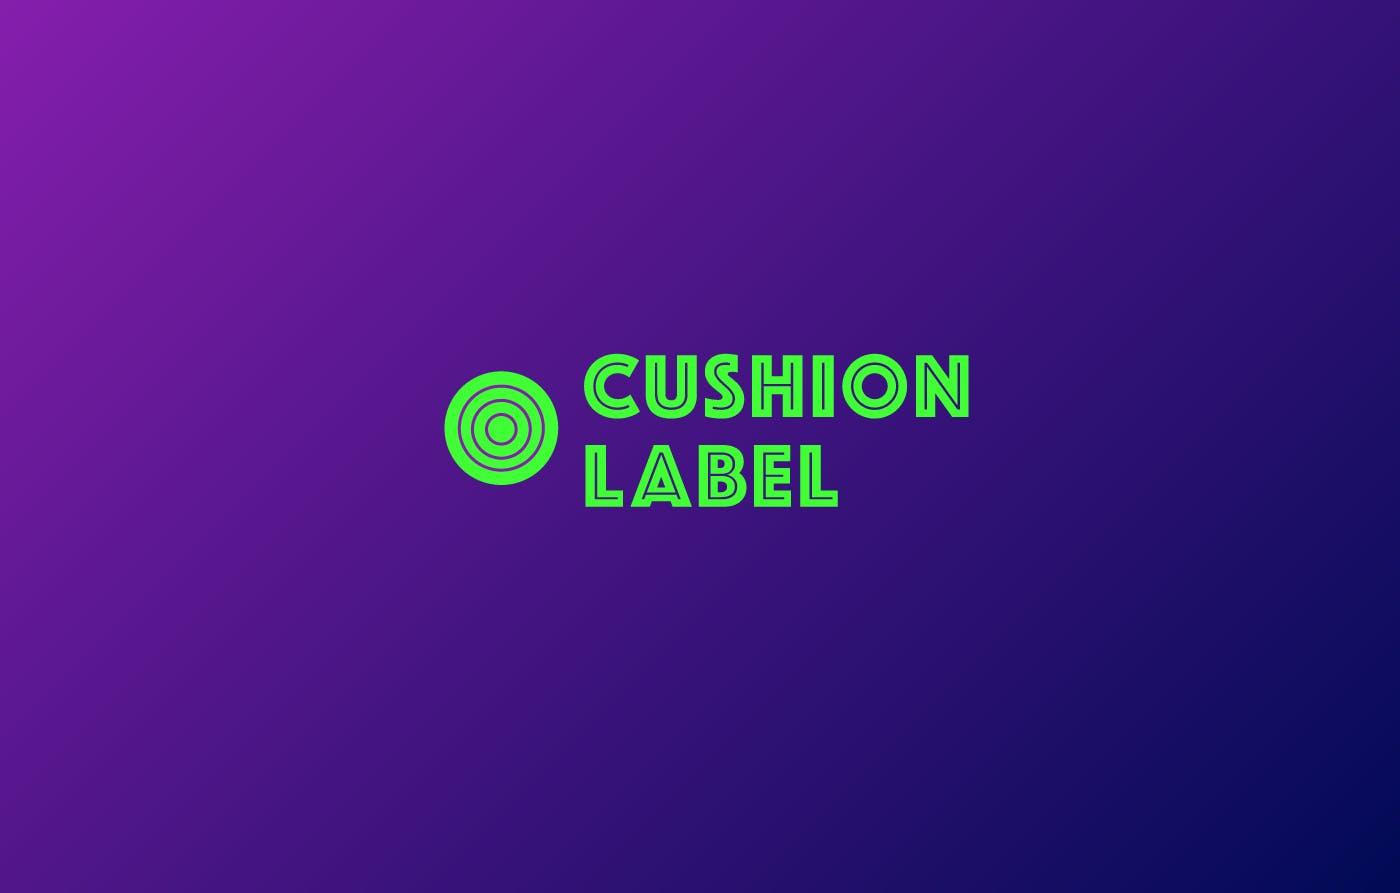 cushion-label.jpg